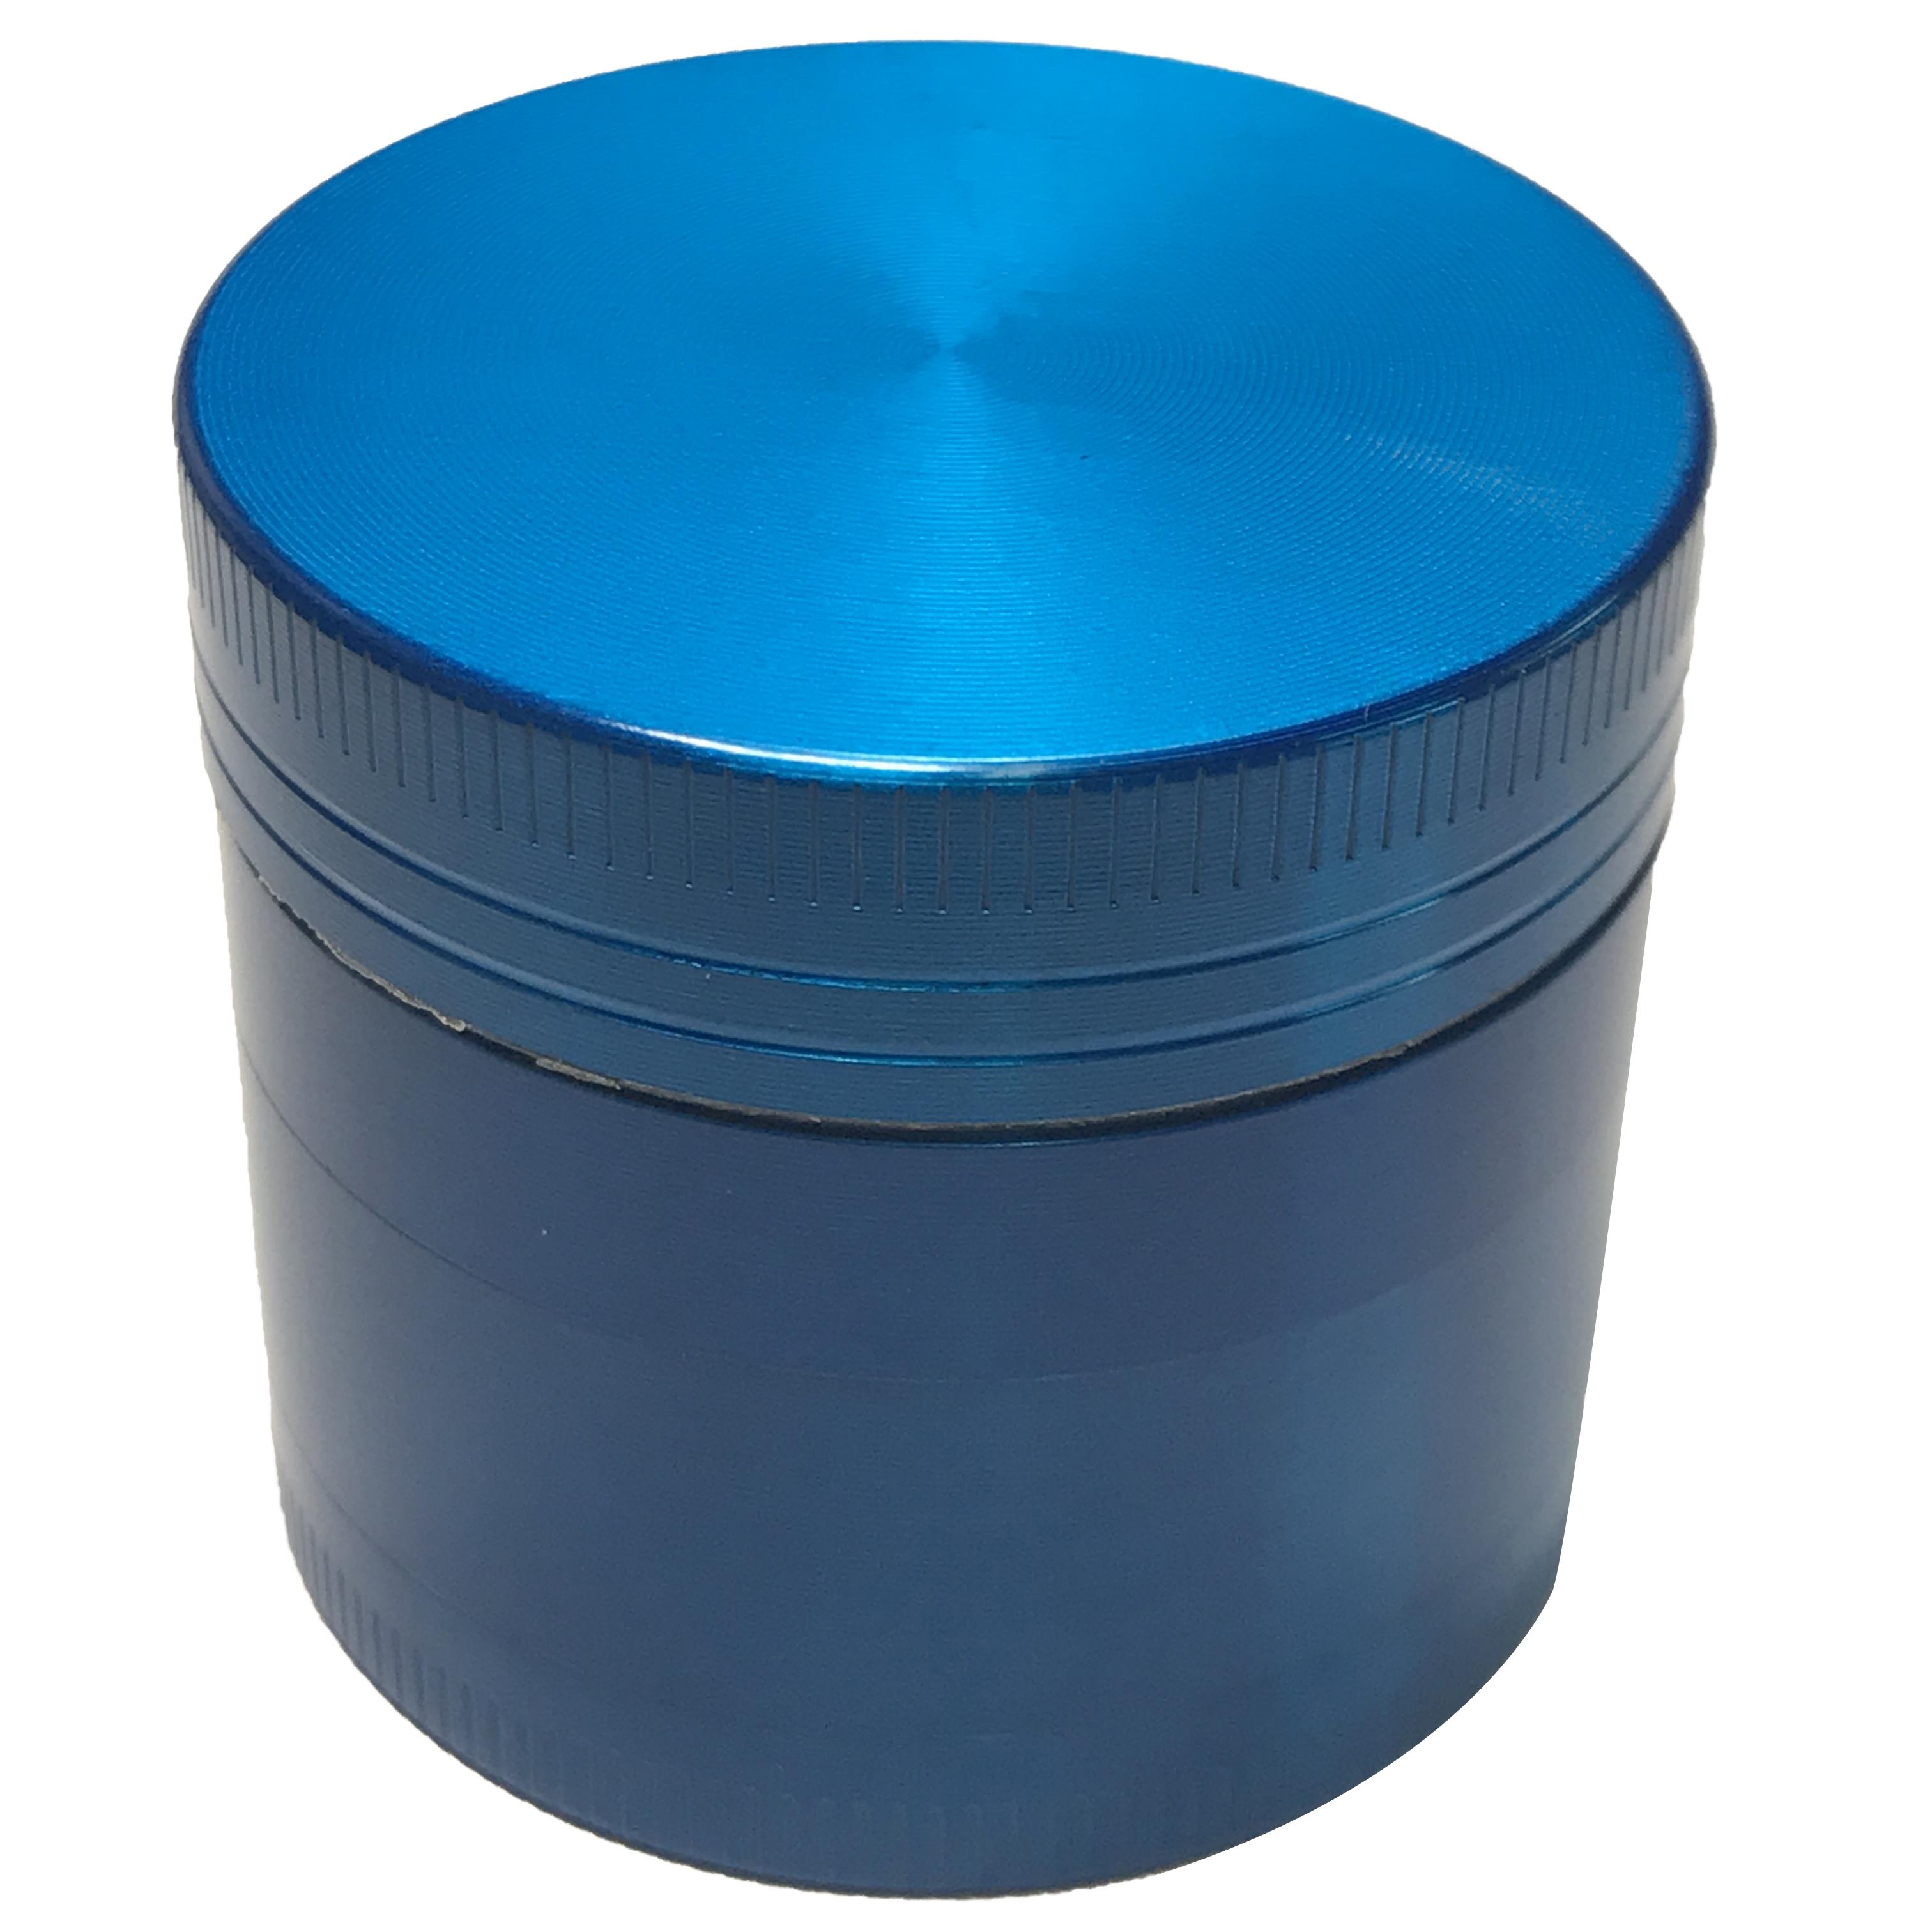 "Sharper 5 Pc Hand Crank Dragon Grinder 2.5/"" Herb Tobacco Spice Clear Top Blue"